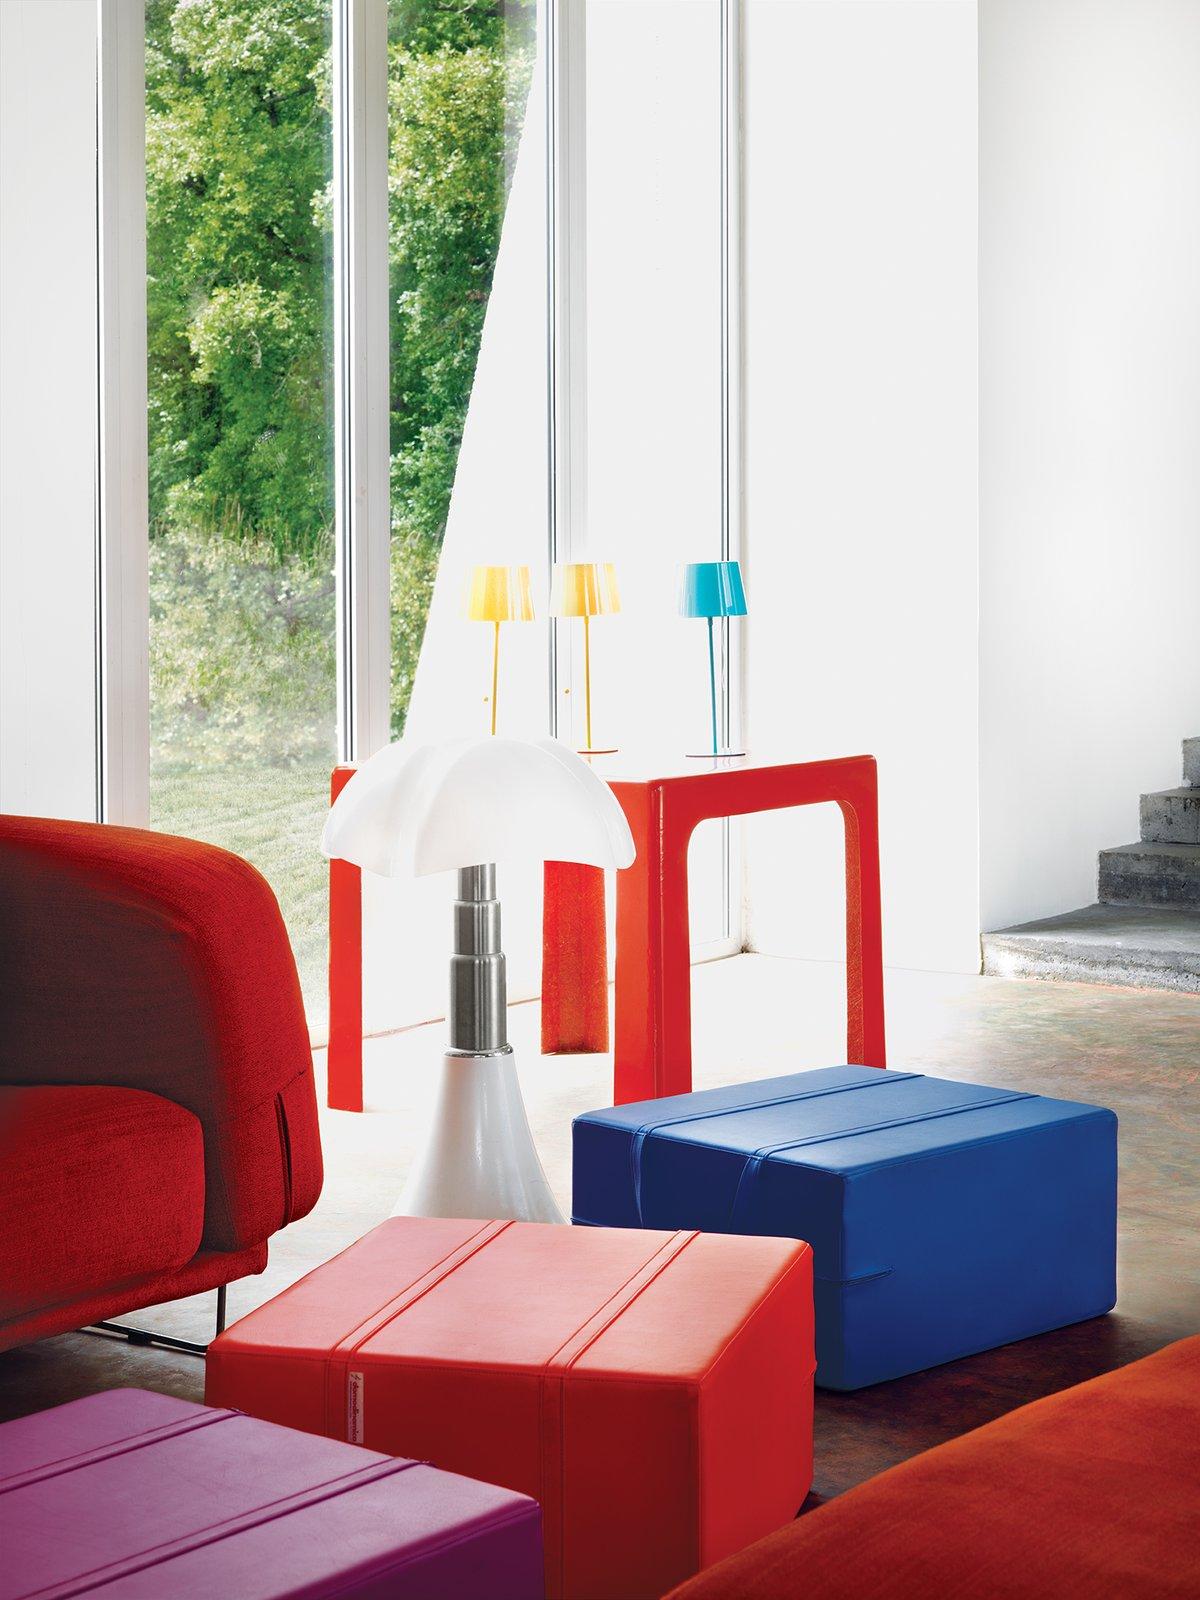 #color #livingroom #ottomans #redchair #floorlamp  Photo by Jonas Ingerstedt   36+ Interior Color Pop Ideas For Modern Homes